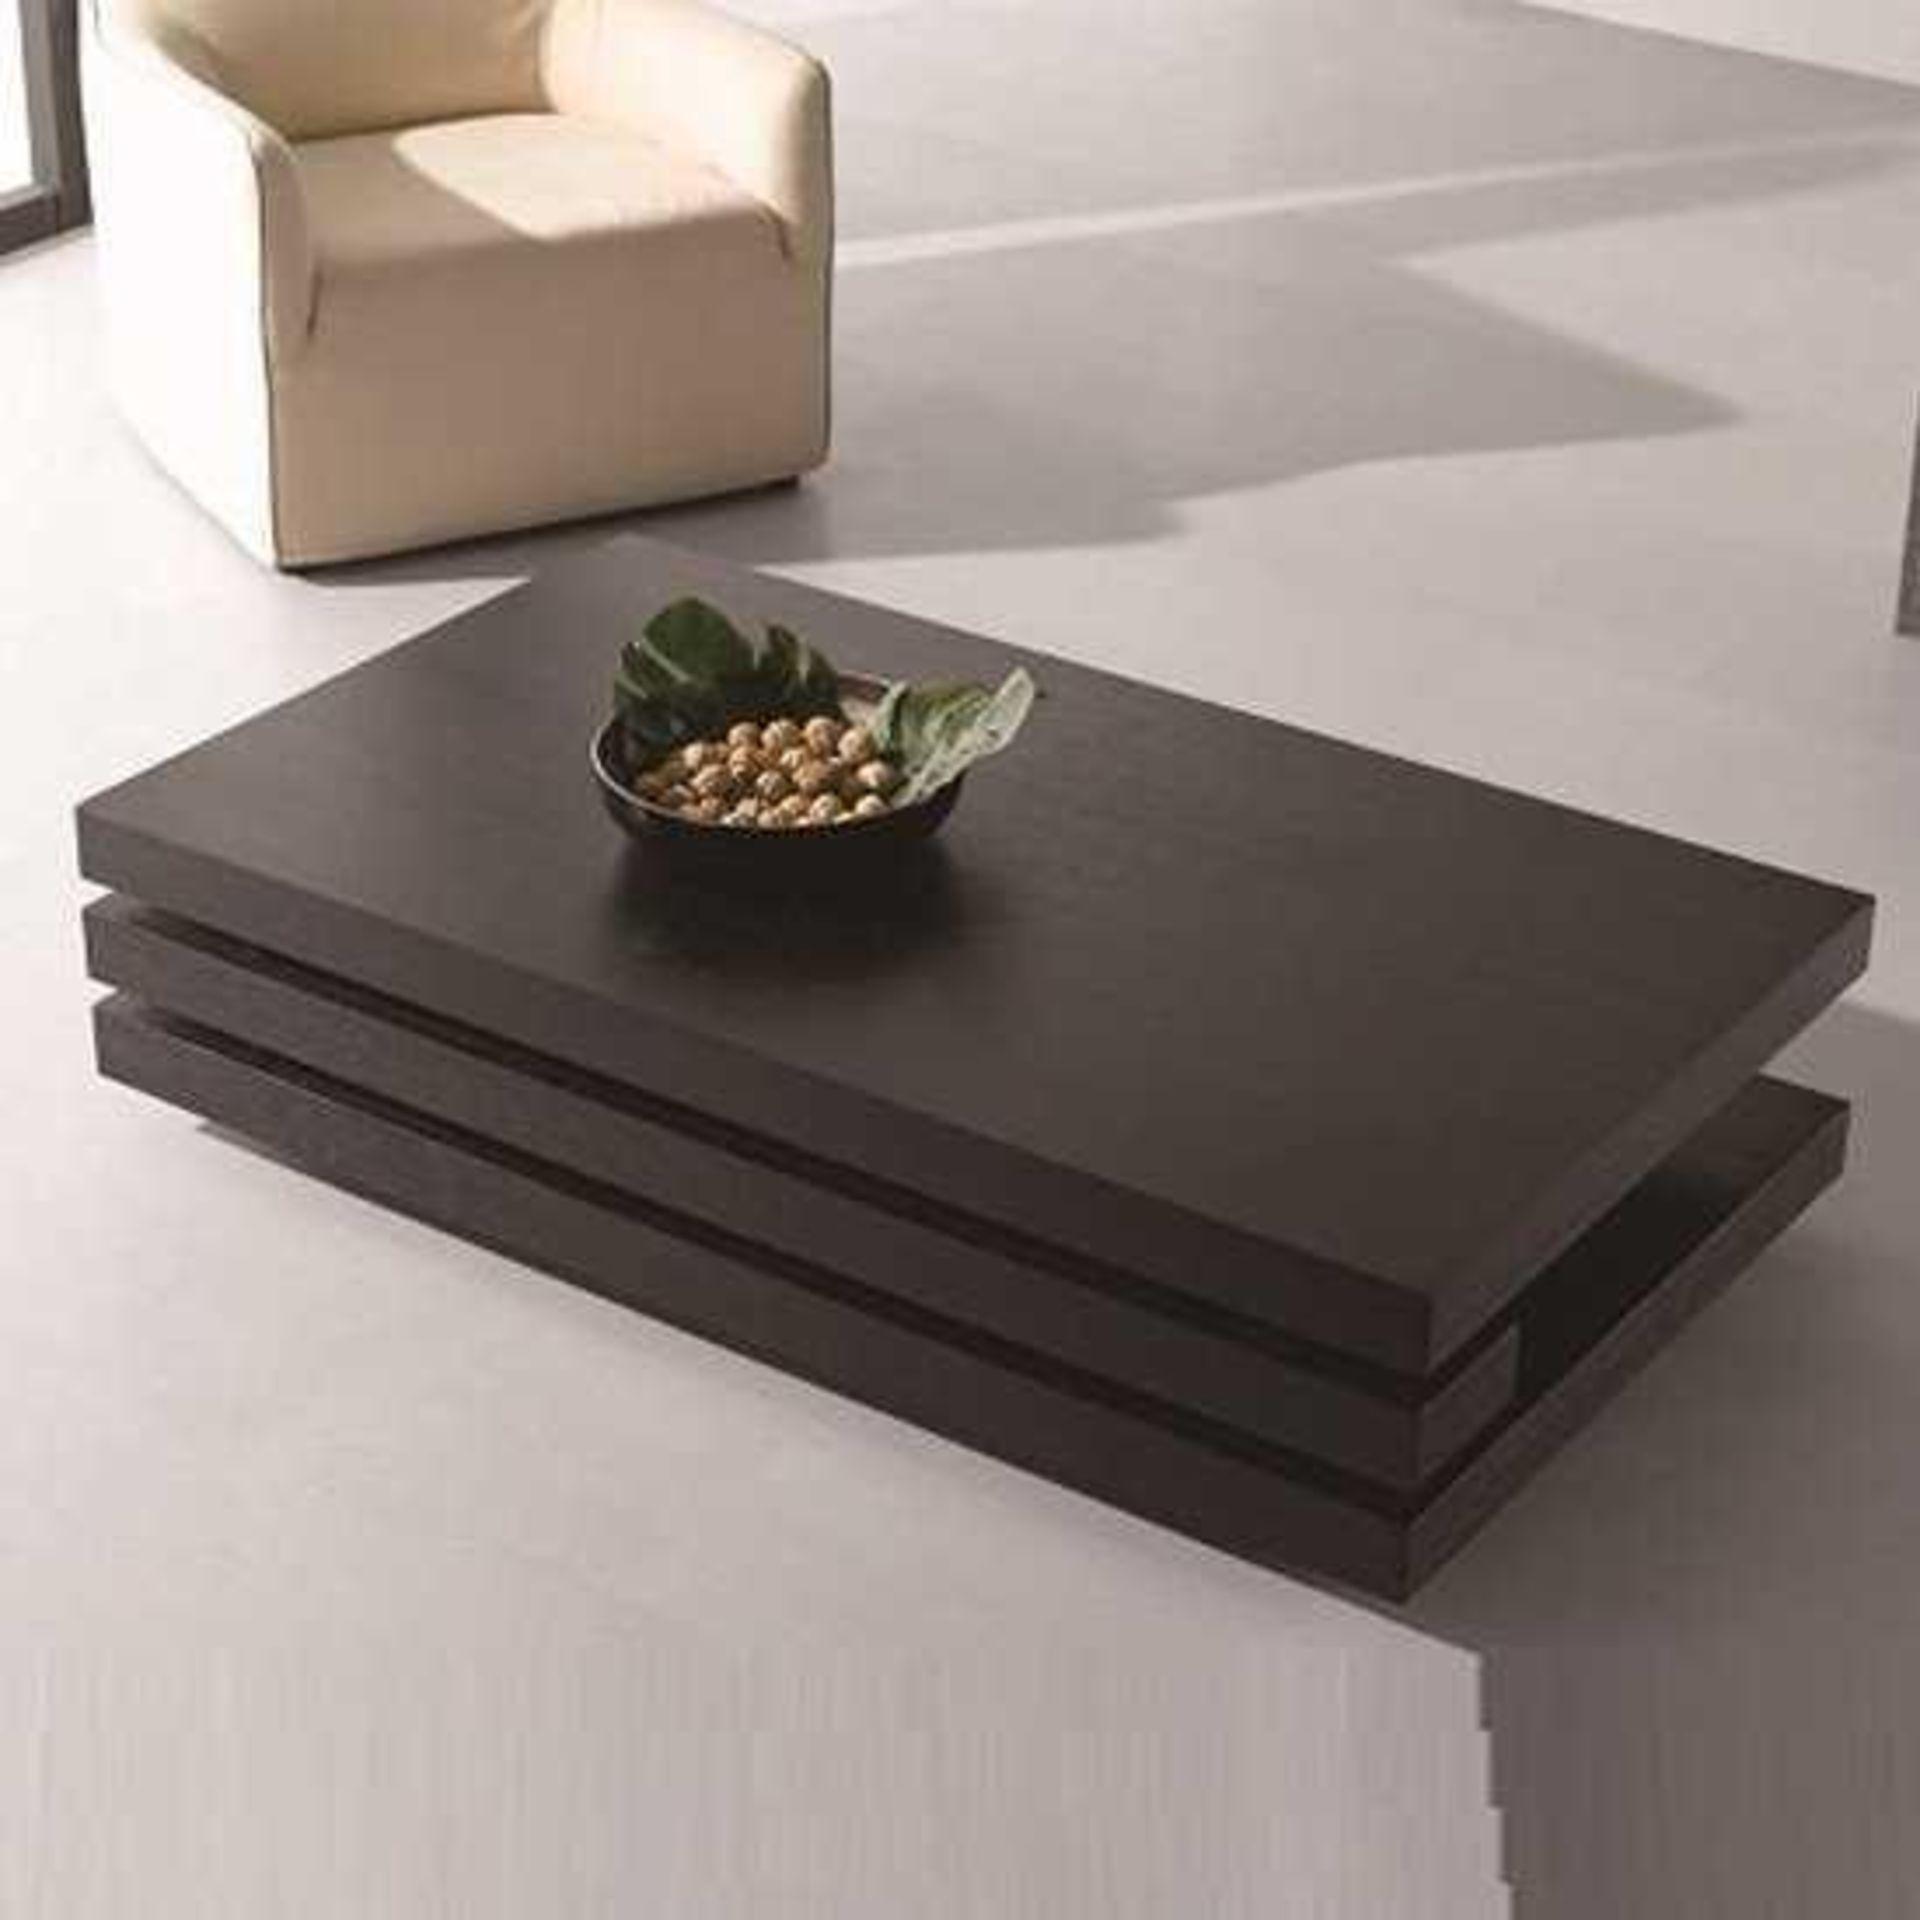 RRP £270 - Boxed 'Palma' Rectangular Coffee Table In Black Oak Veneer